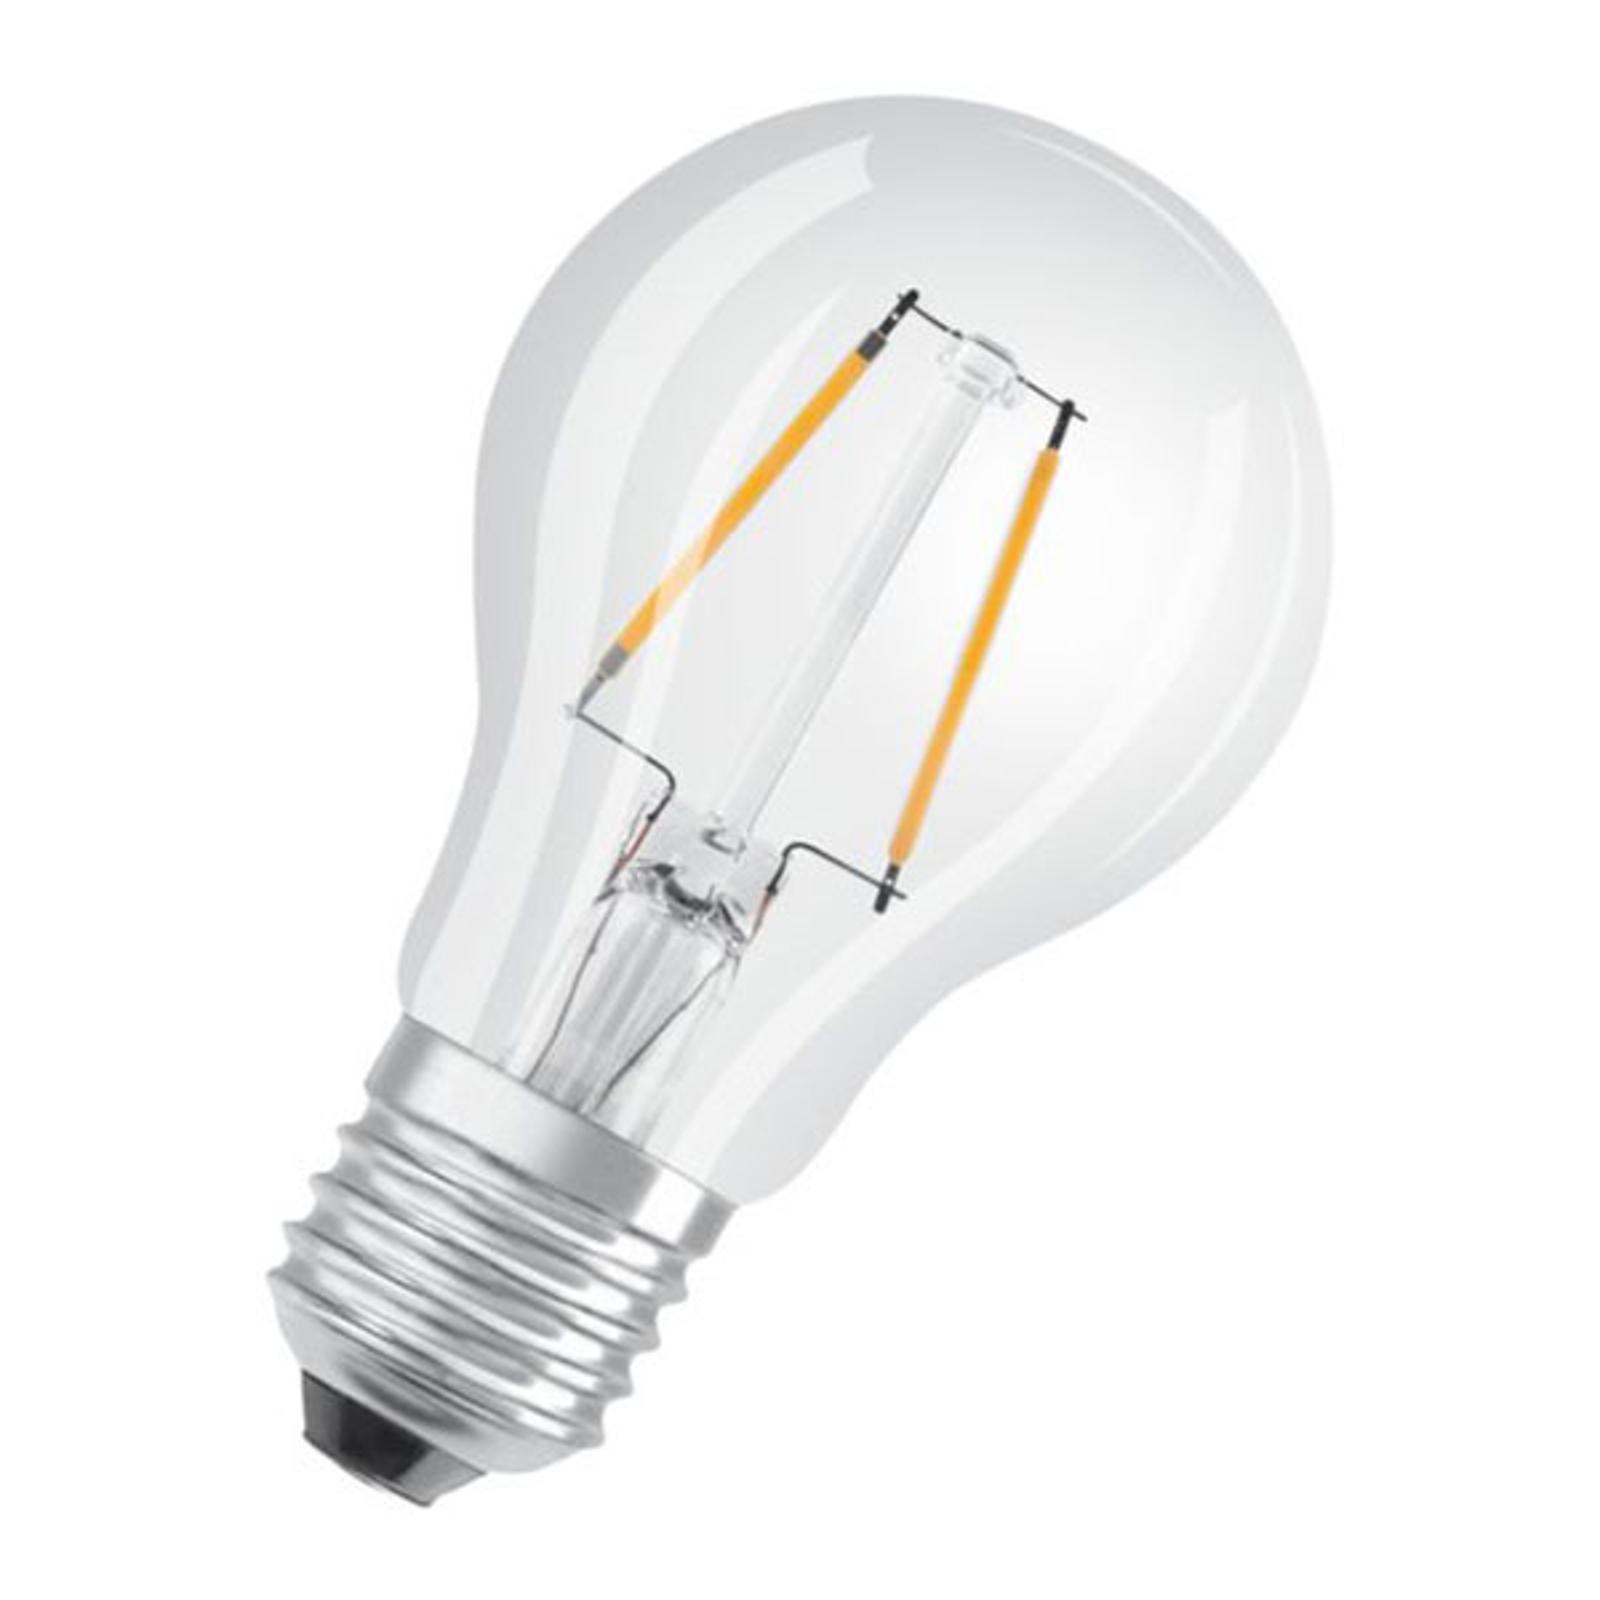 OSRAM Classic A LED-Lampe E27 2,5W 2.700K klar